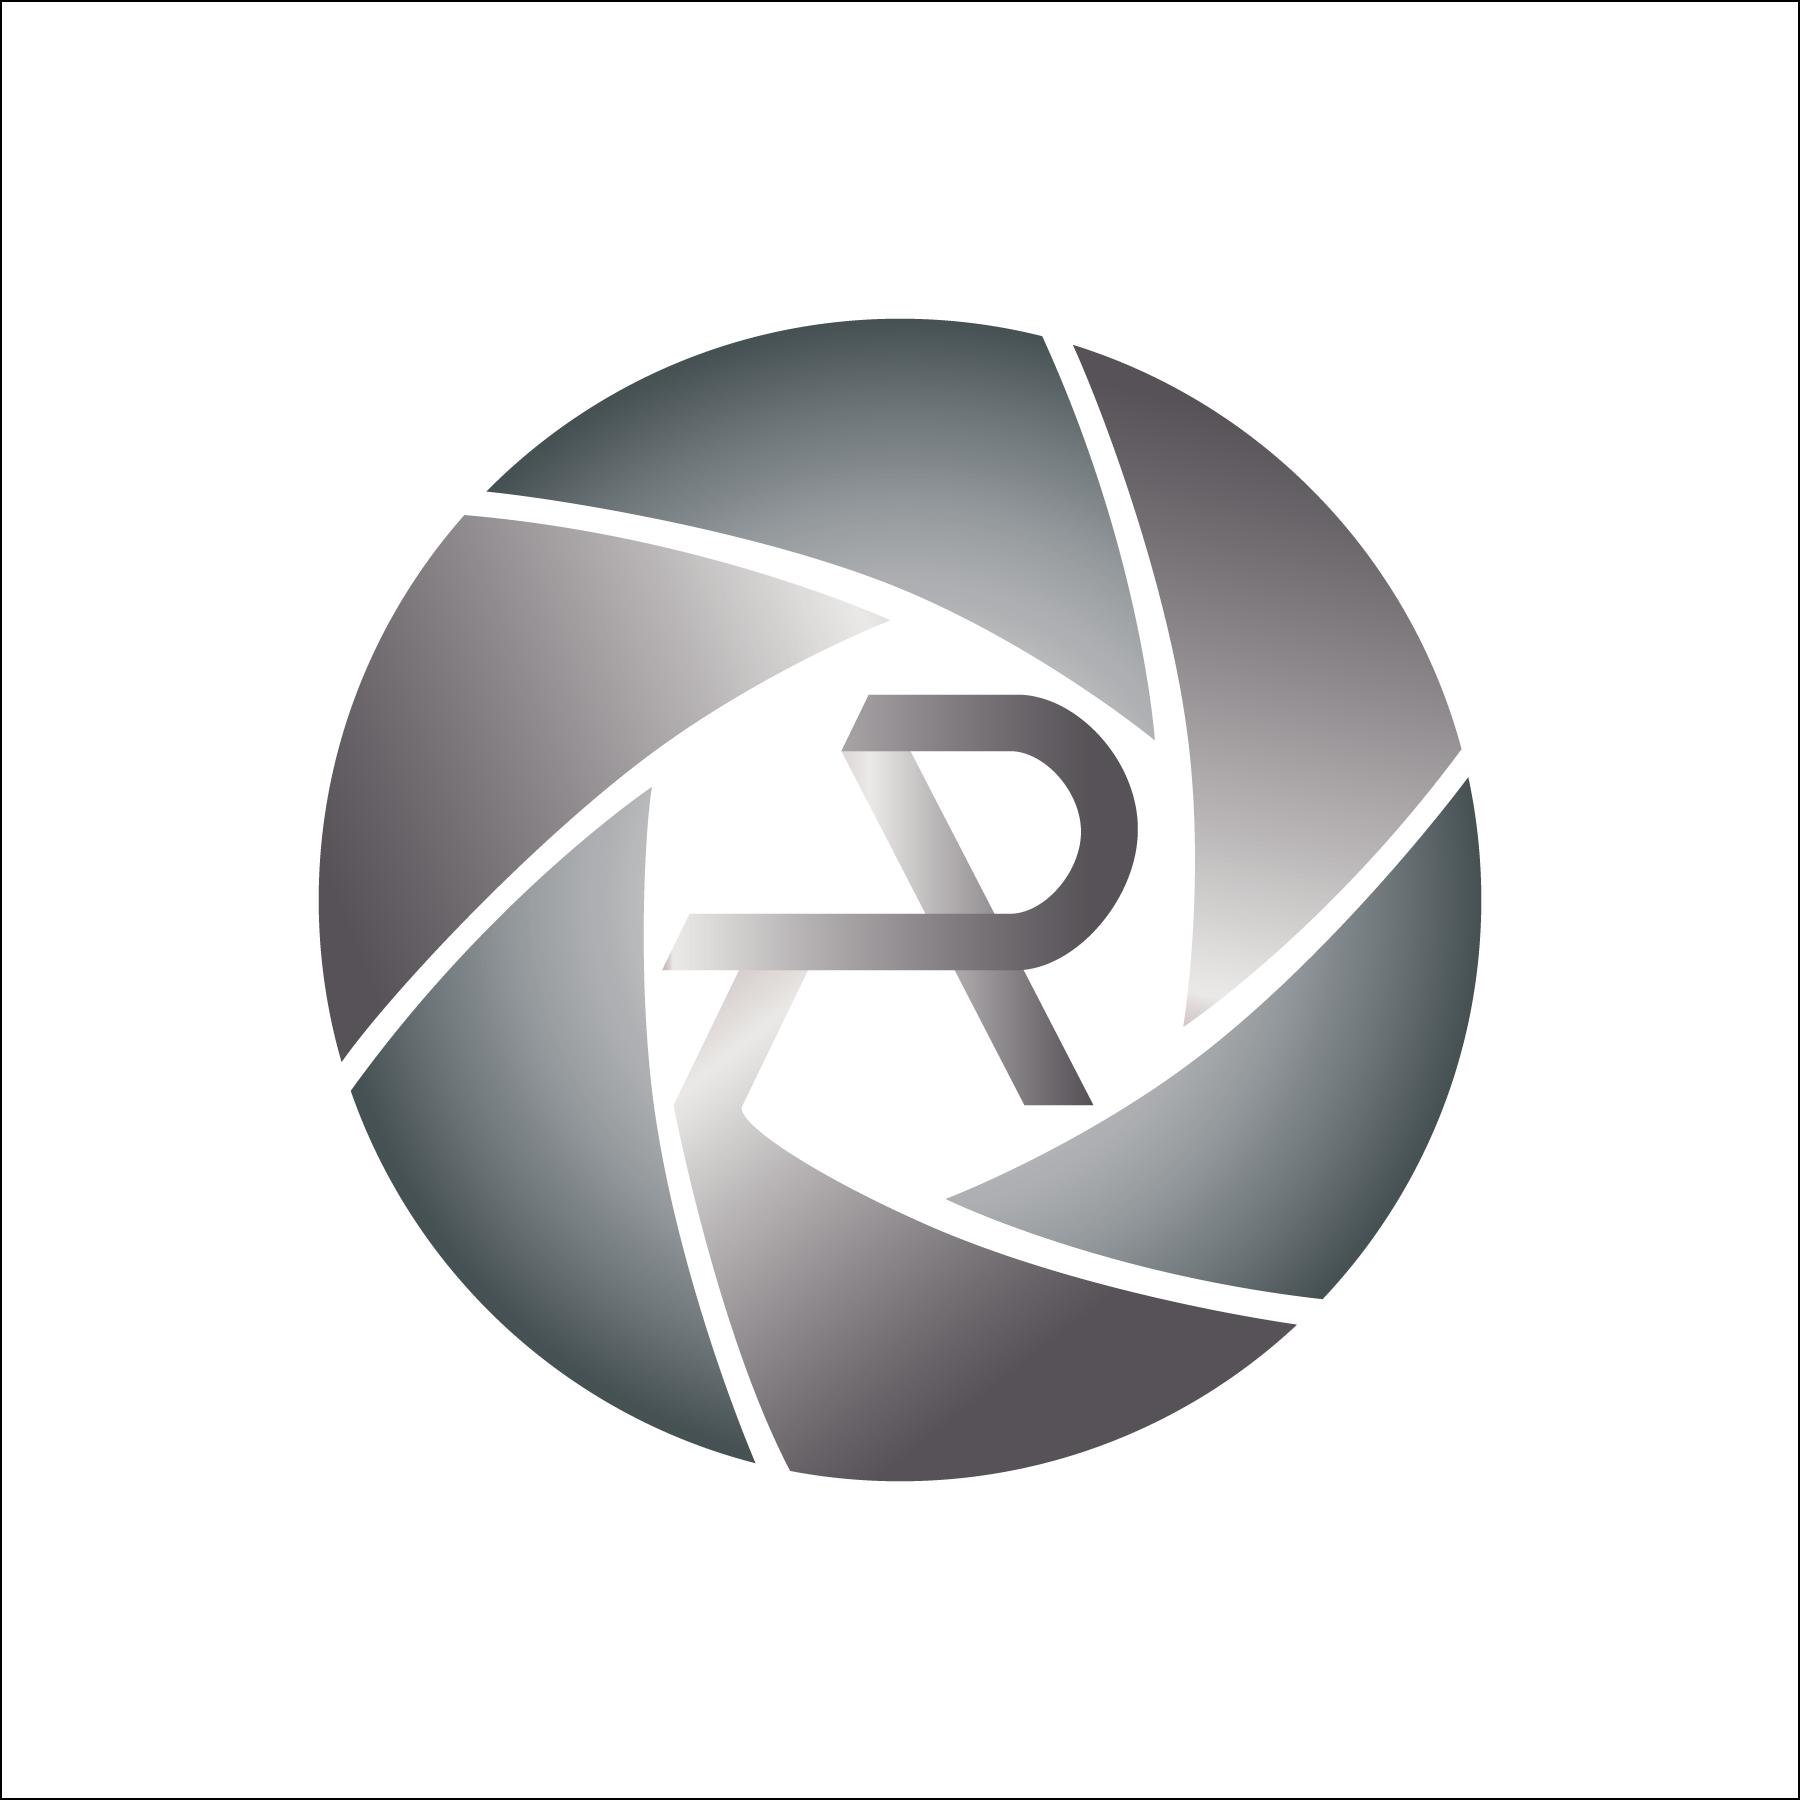 Ap Photography Logo Design Png